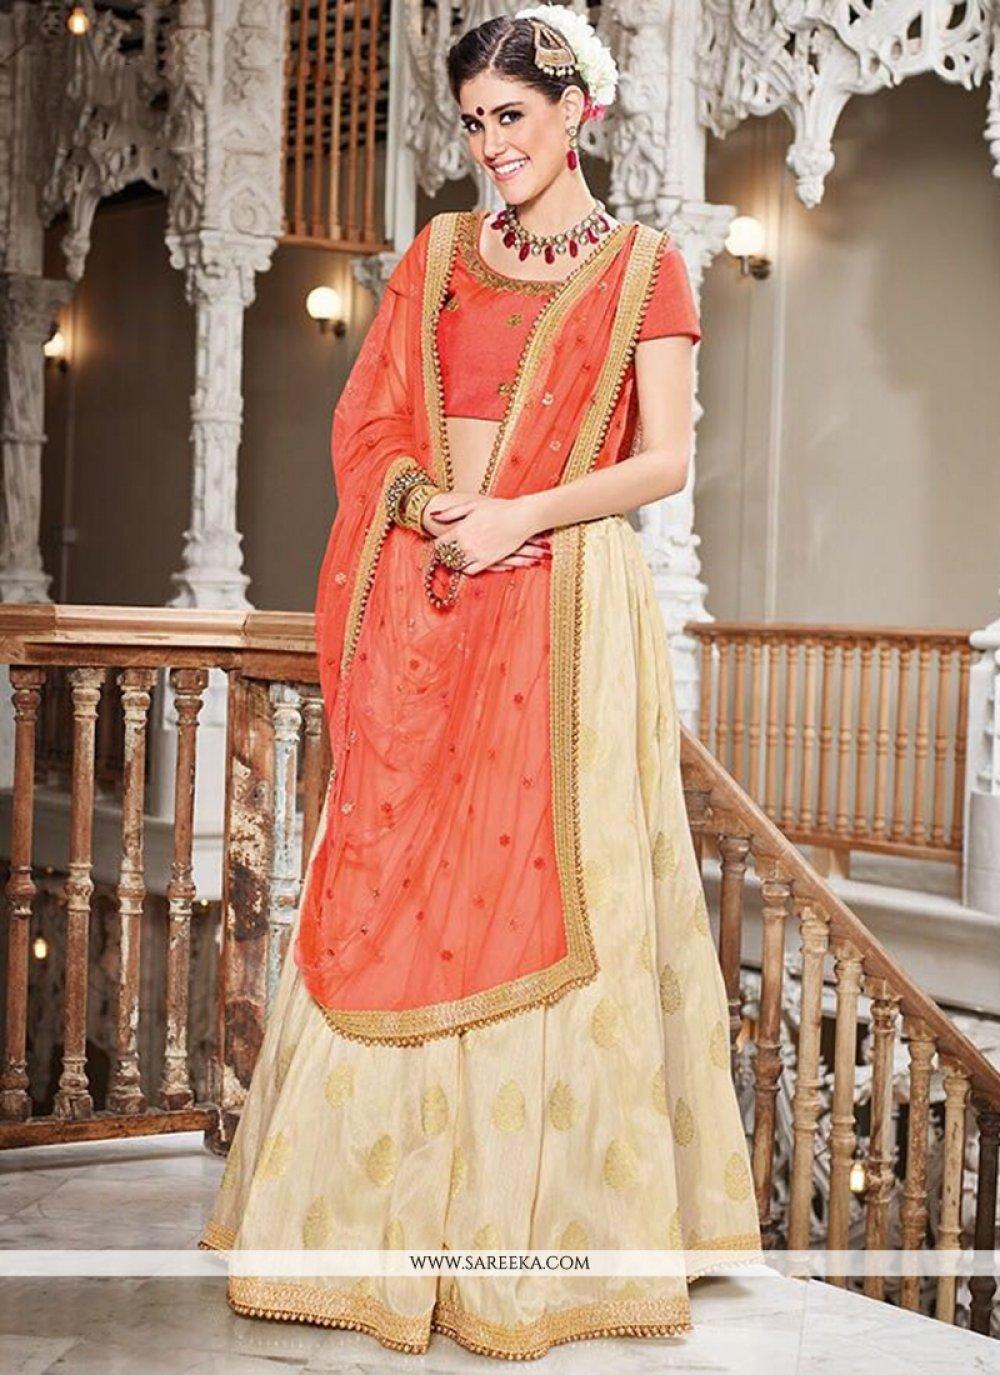 Jacquard Lace Work Lehenga Choli